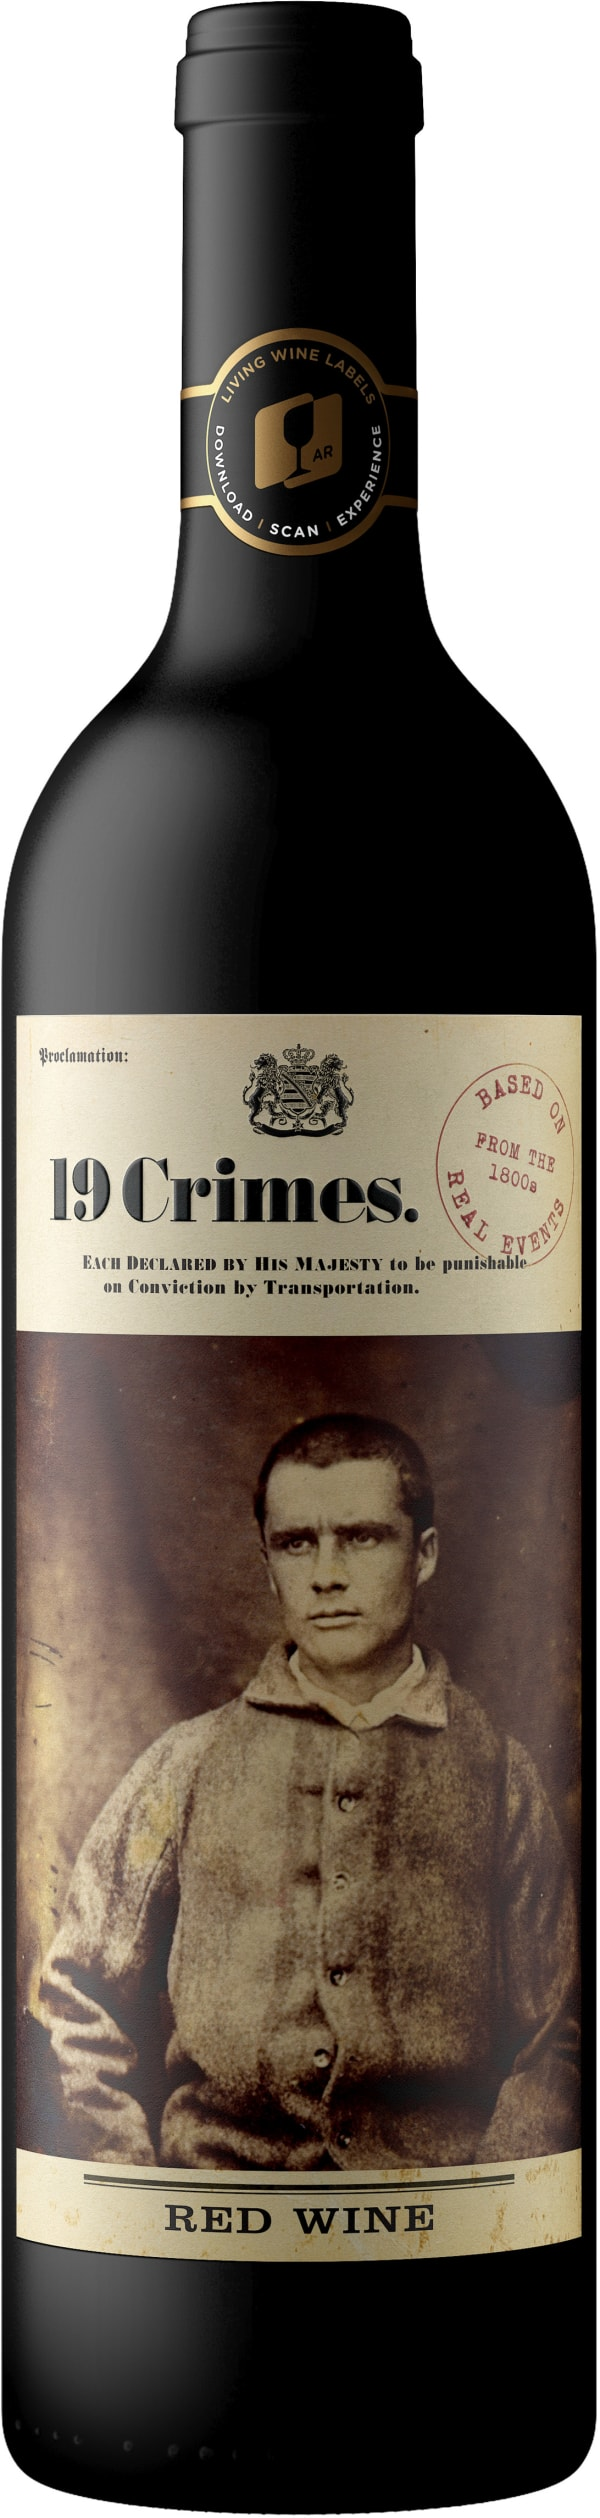 19 Crimes Red wine 2017